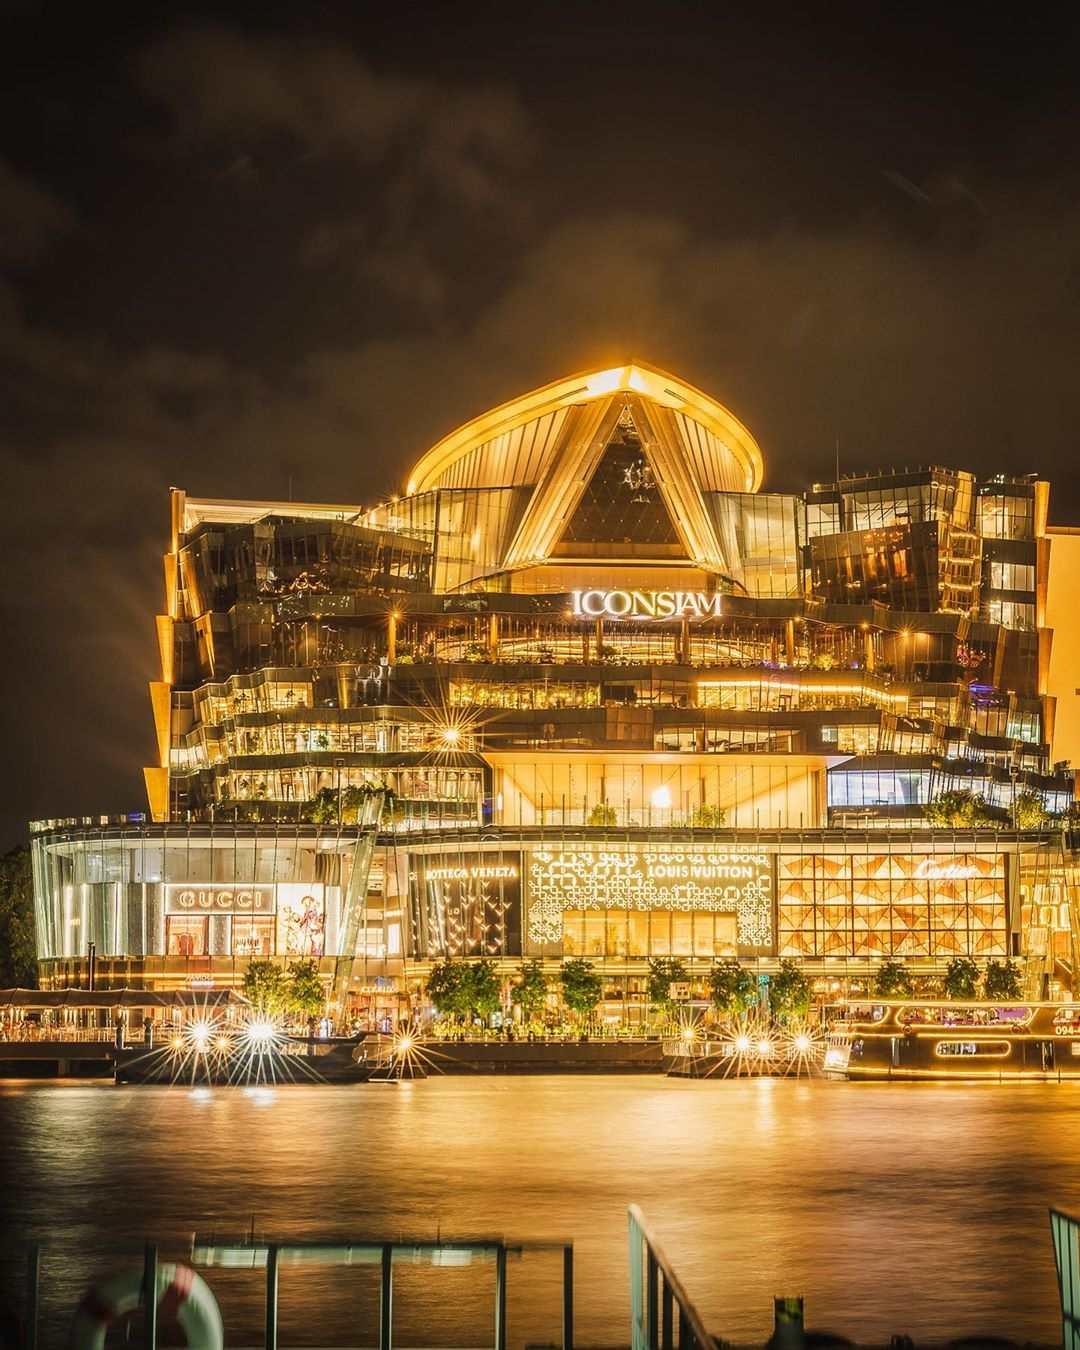 Het mega winkelcentrum ICONSIAM in Bangkok